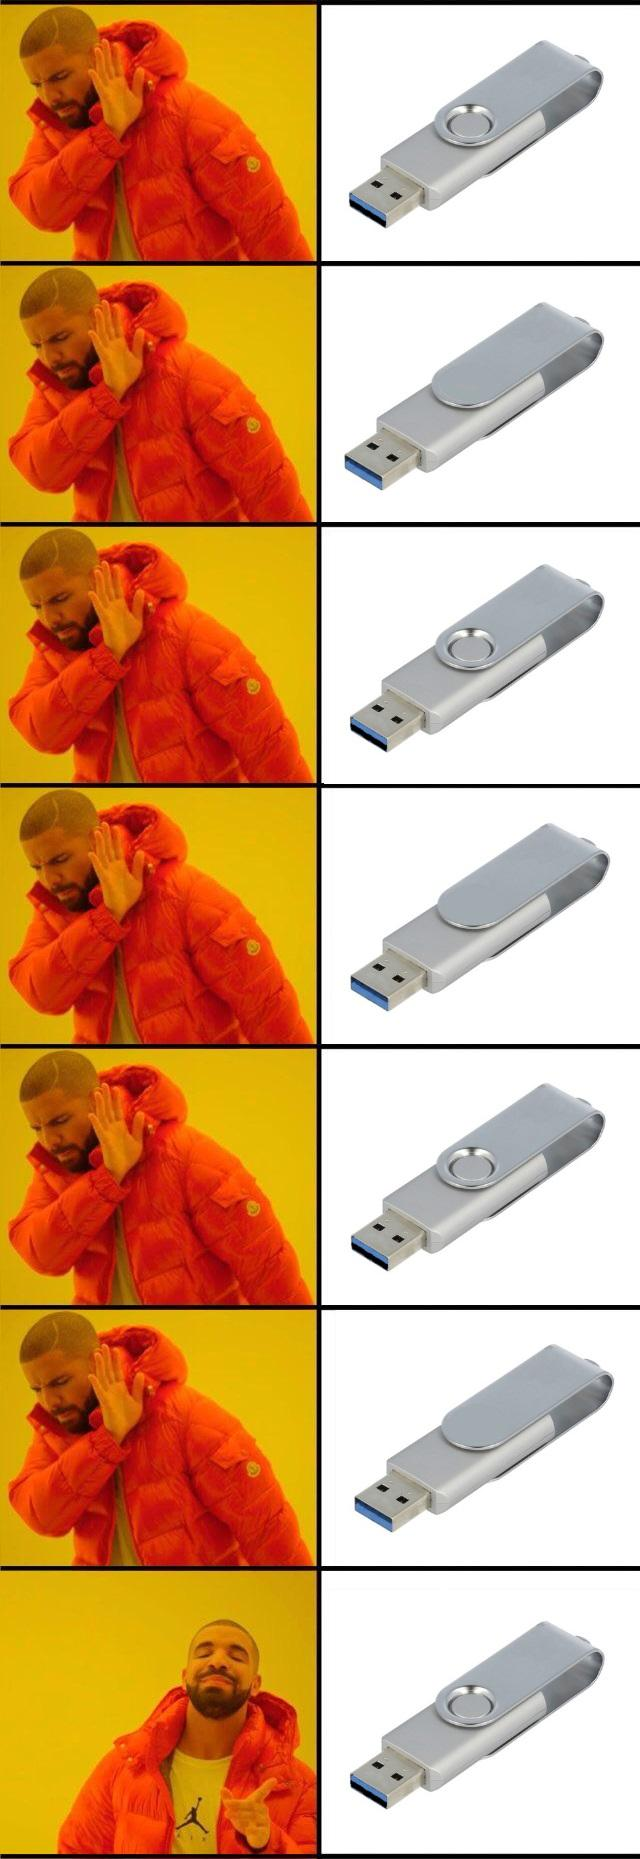 Usb Sticks Be Like Memes